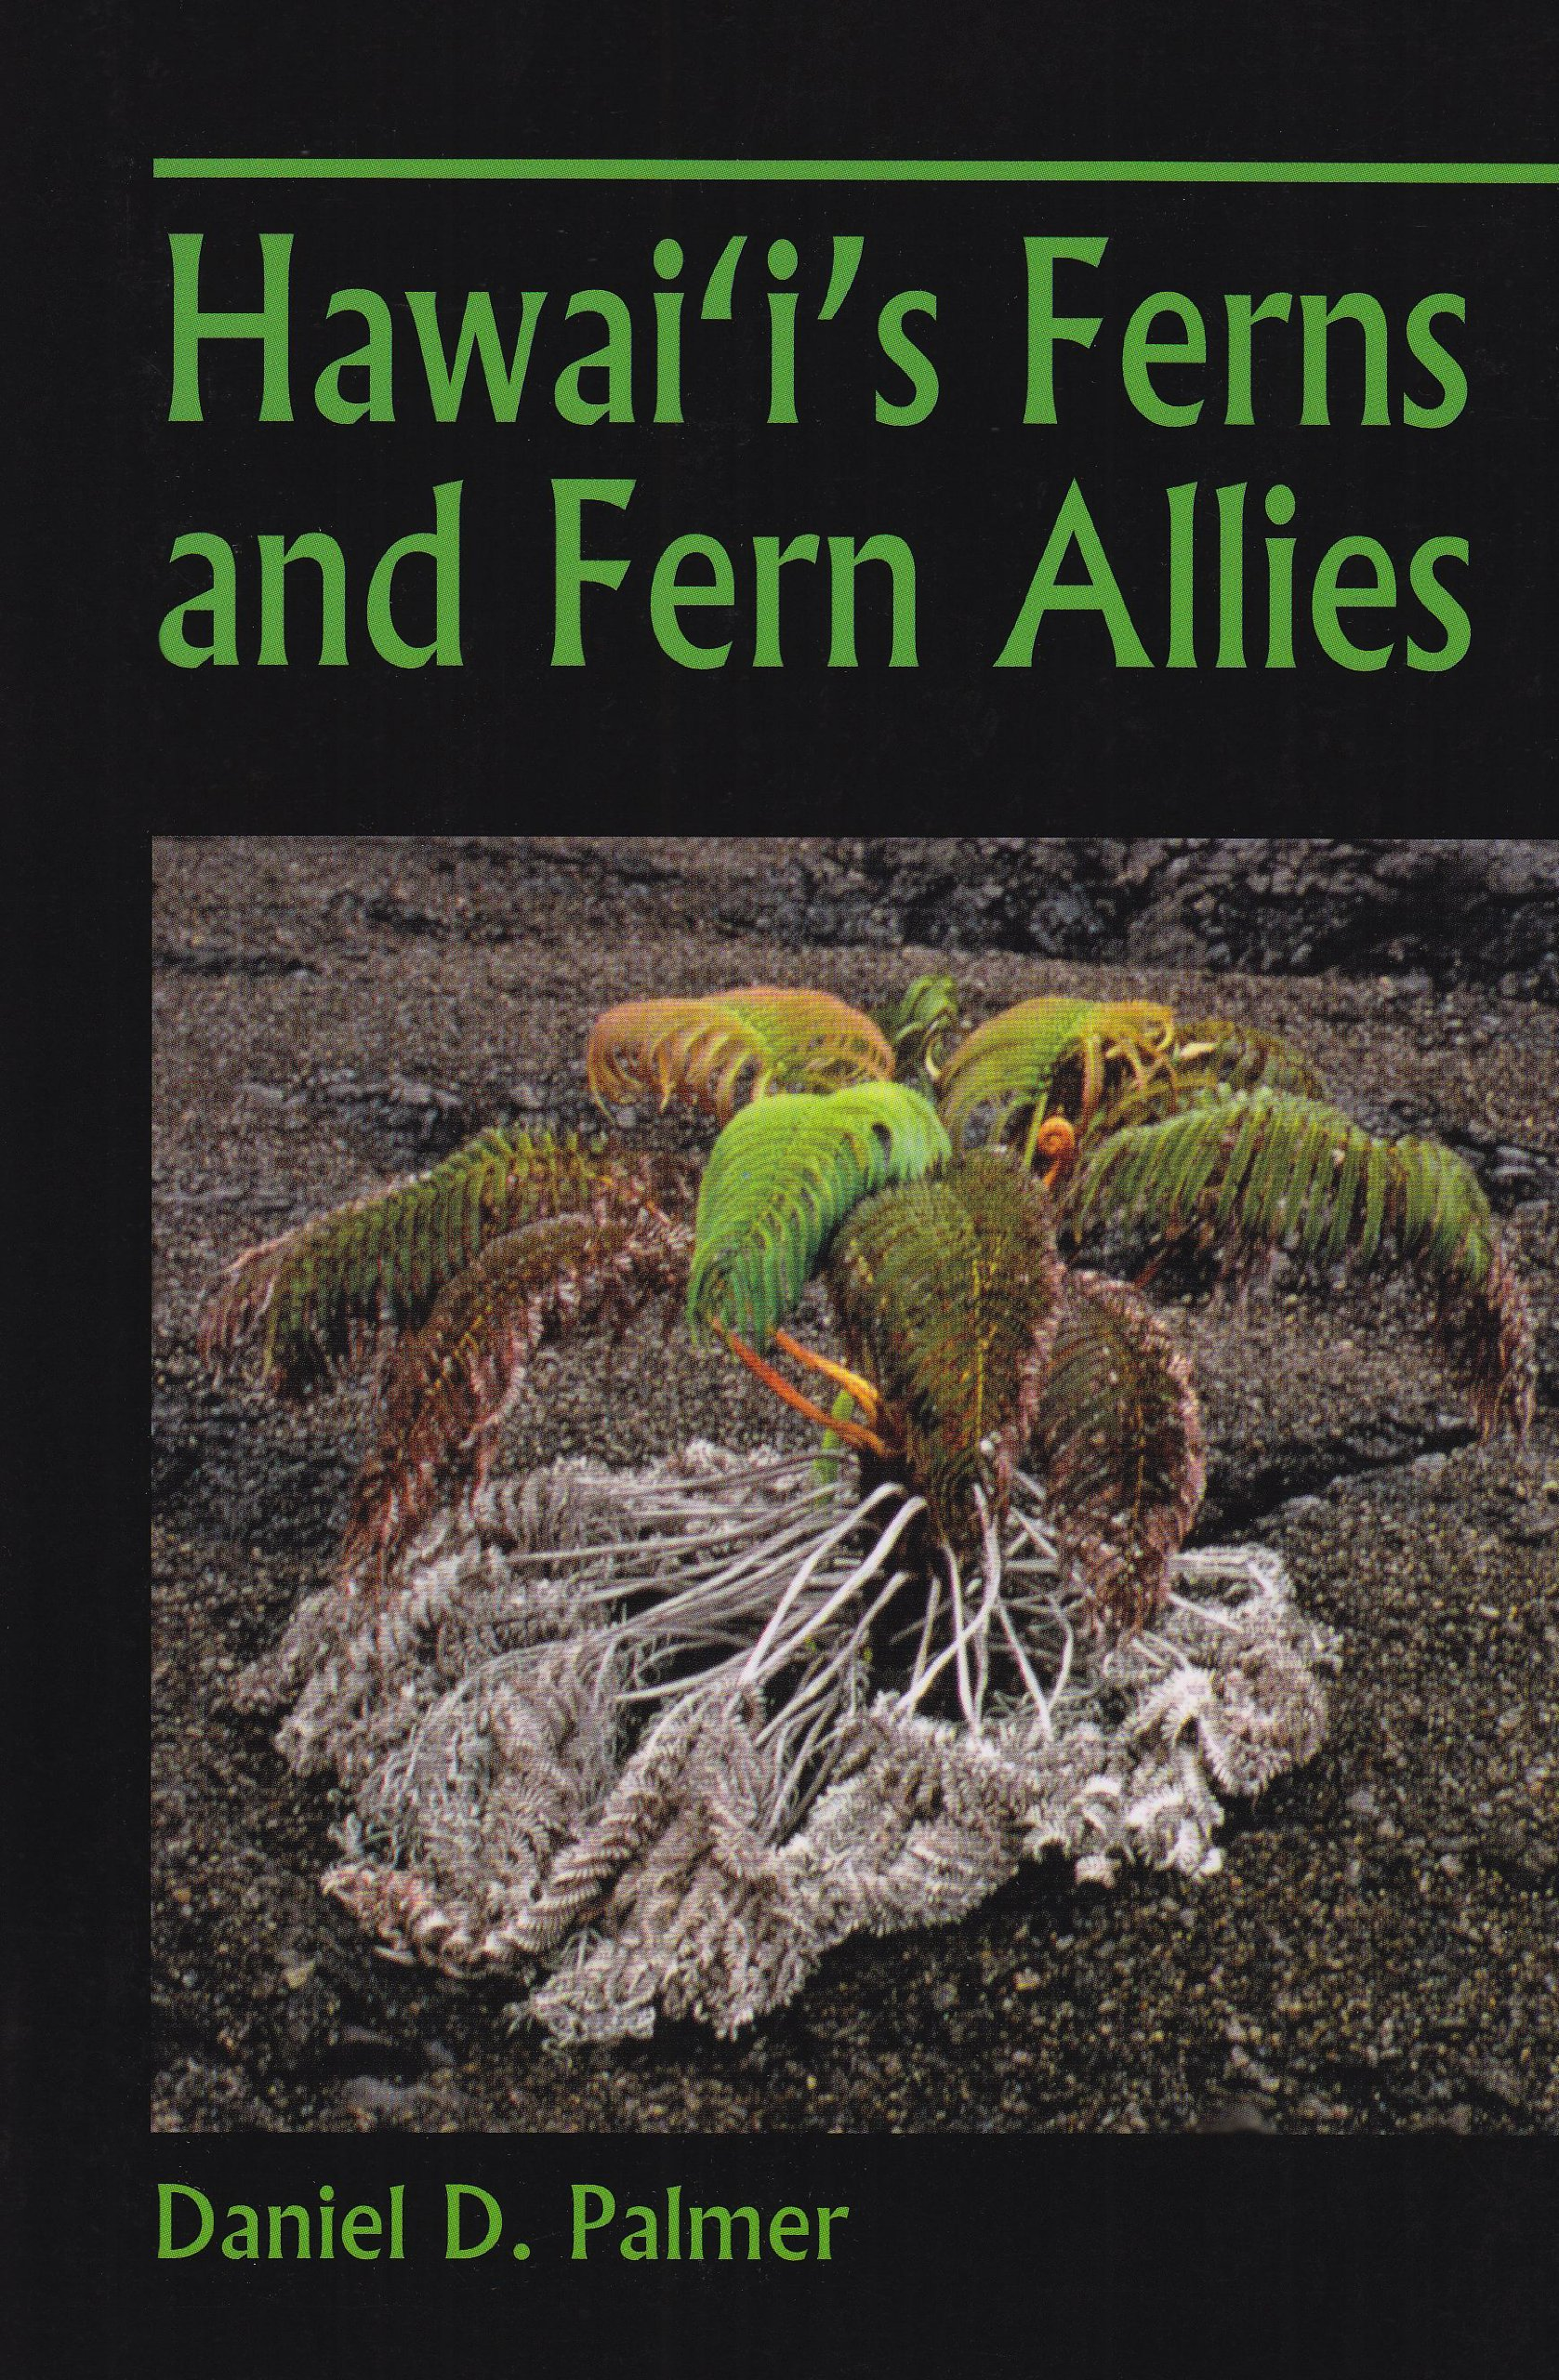 hawaii s ferns and fern allies daniel d palmer 9780824833473